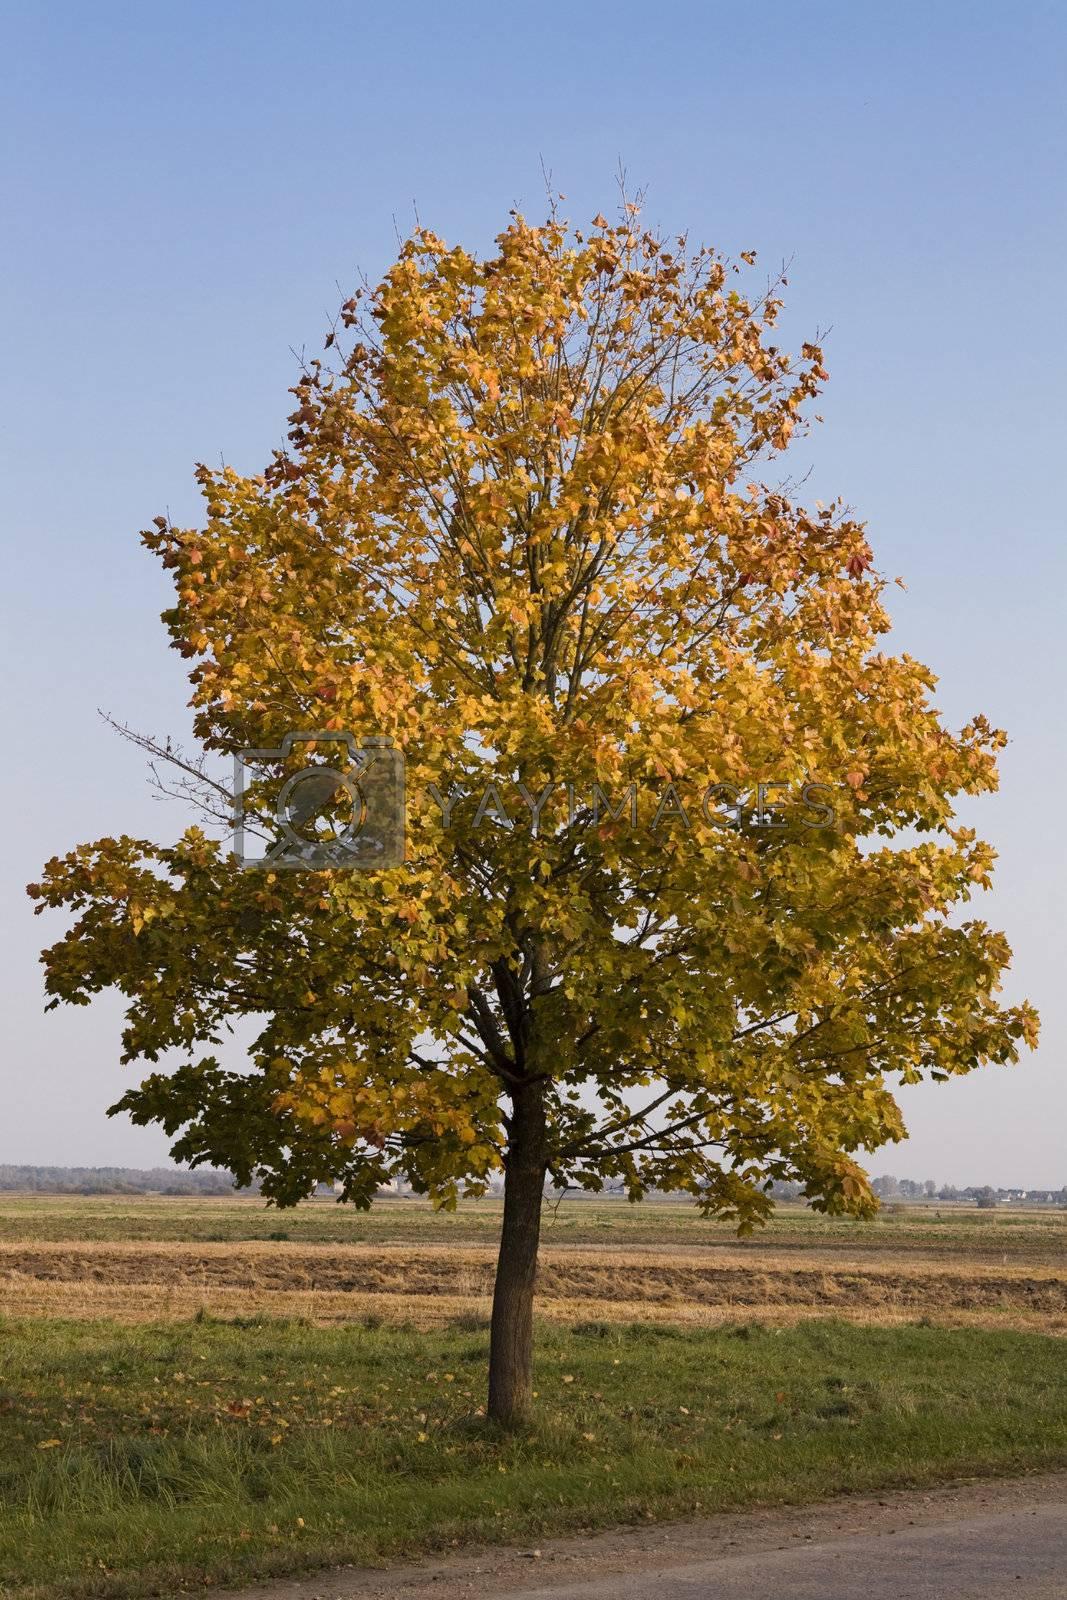 Single autumn tree losing its golden leafs